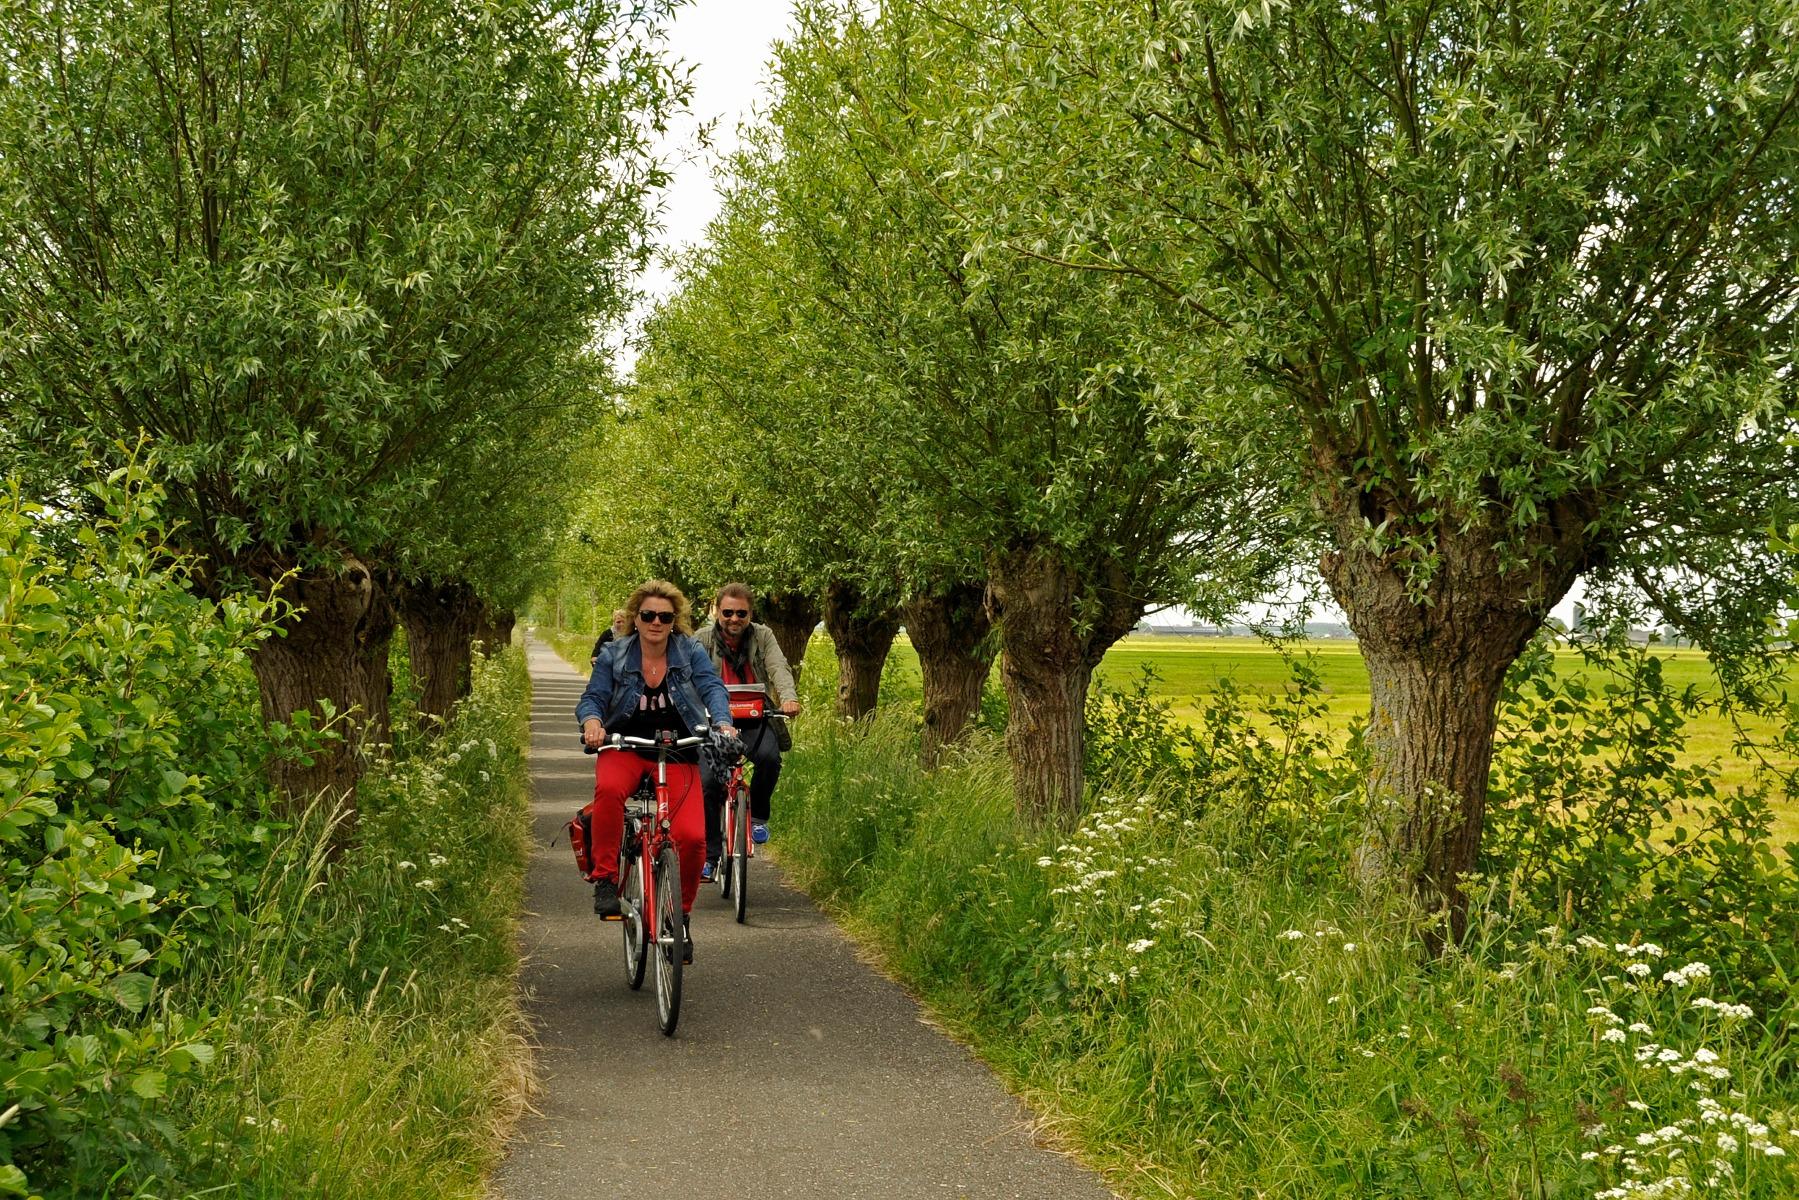 Cykelkrodstogt, cykler, natur